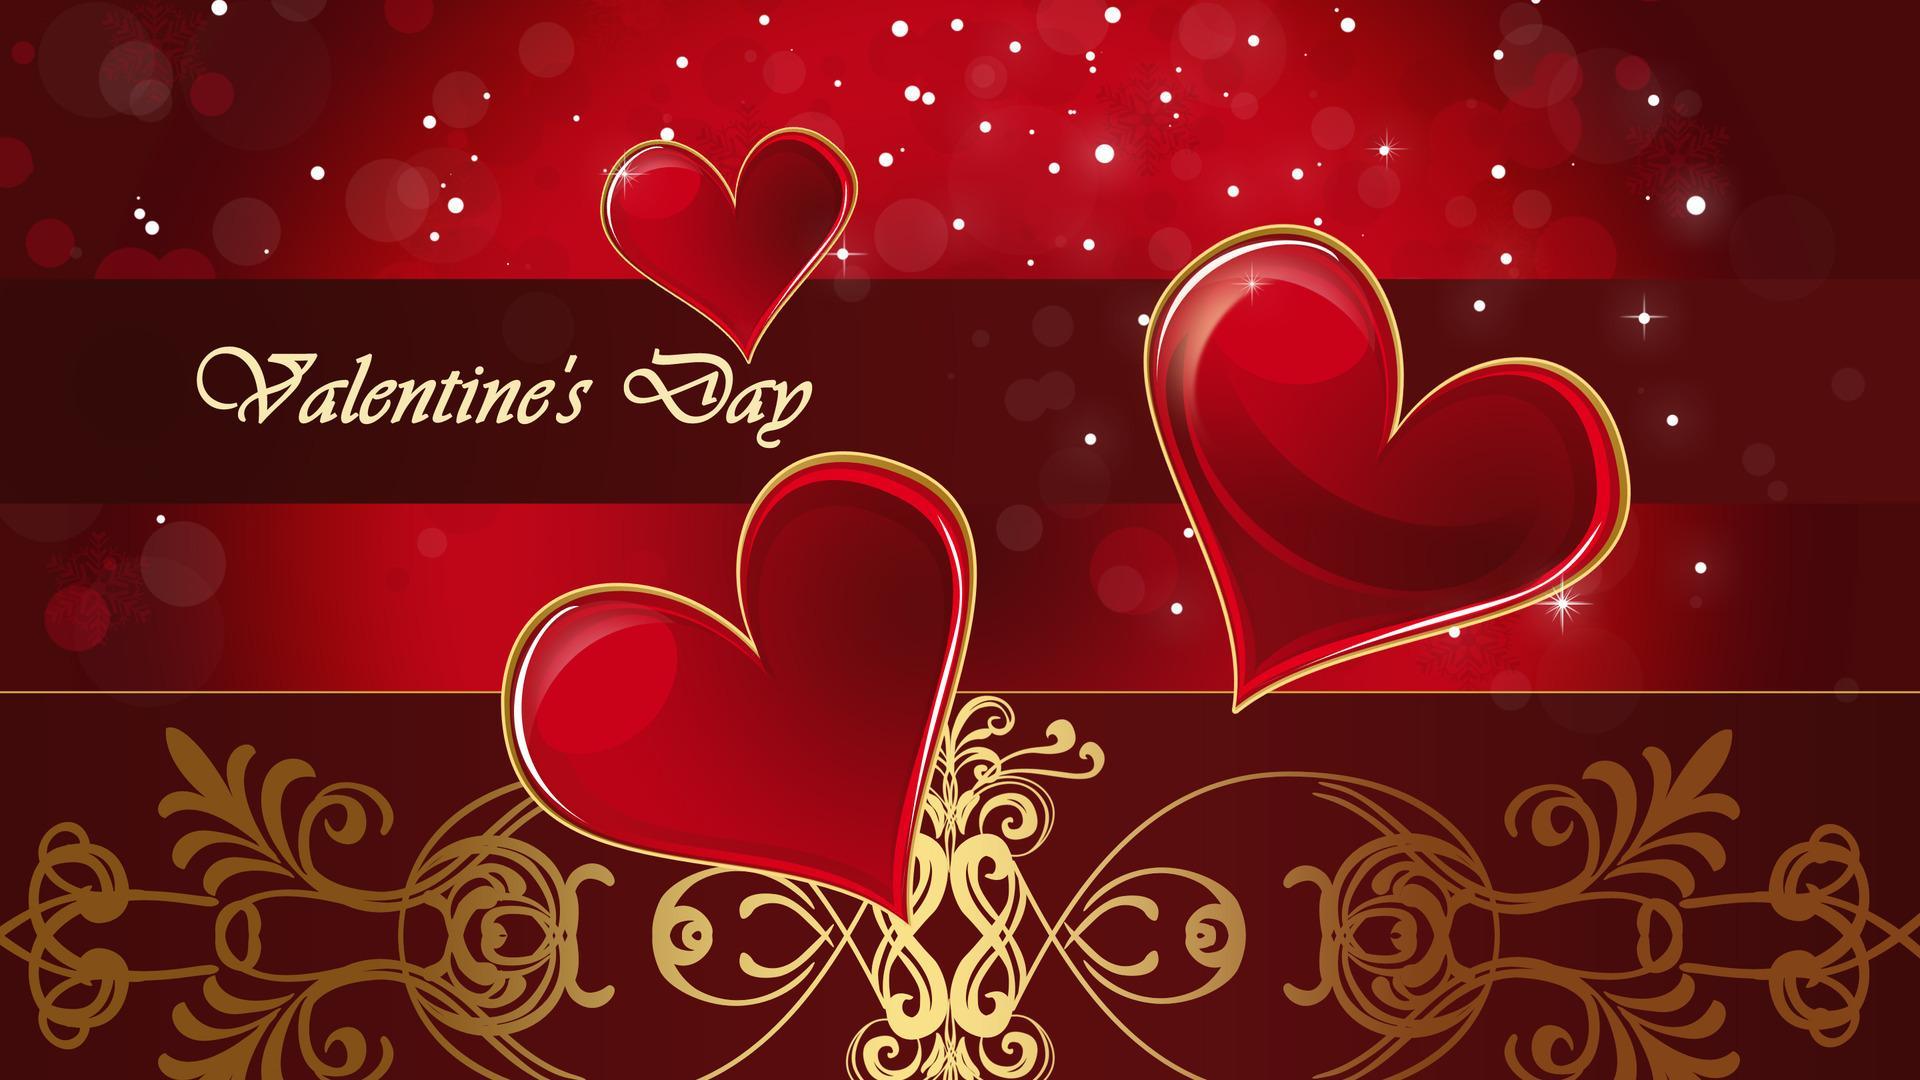 Valentine screensavers wallpaper - San valentin desktop backgrounds ...